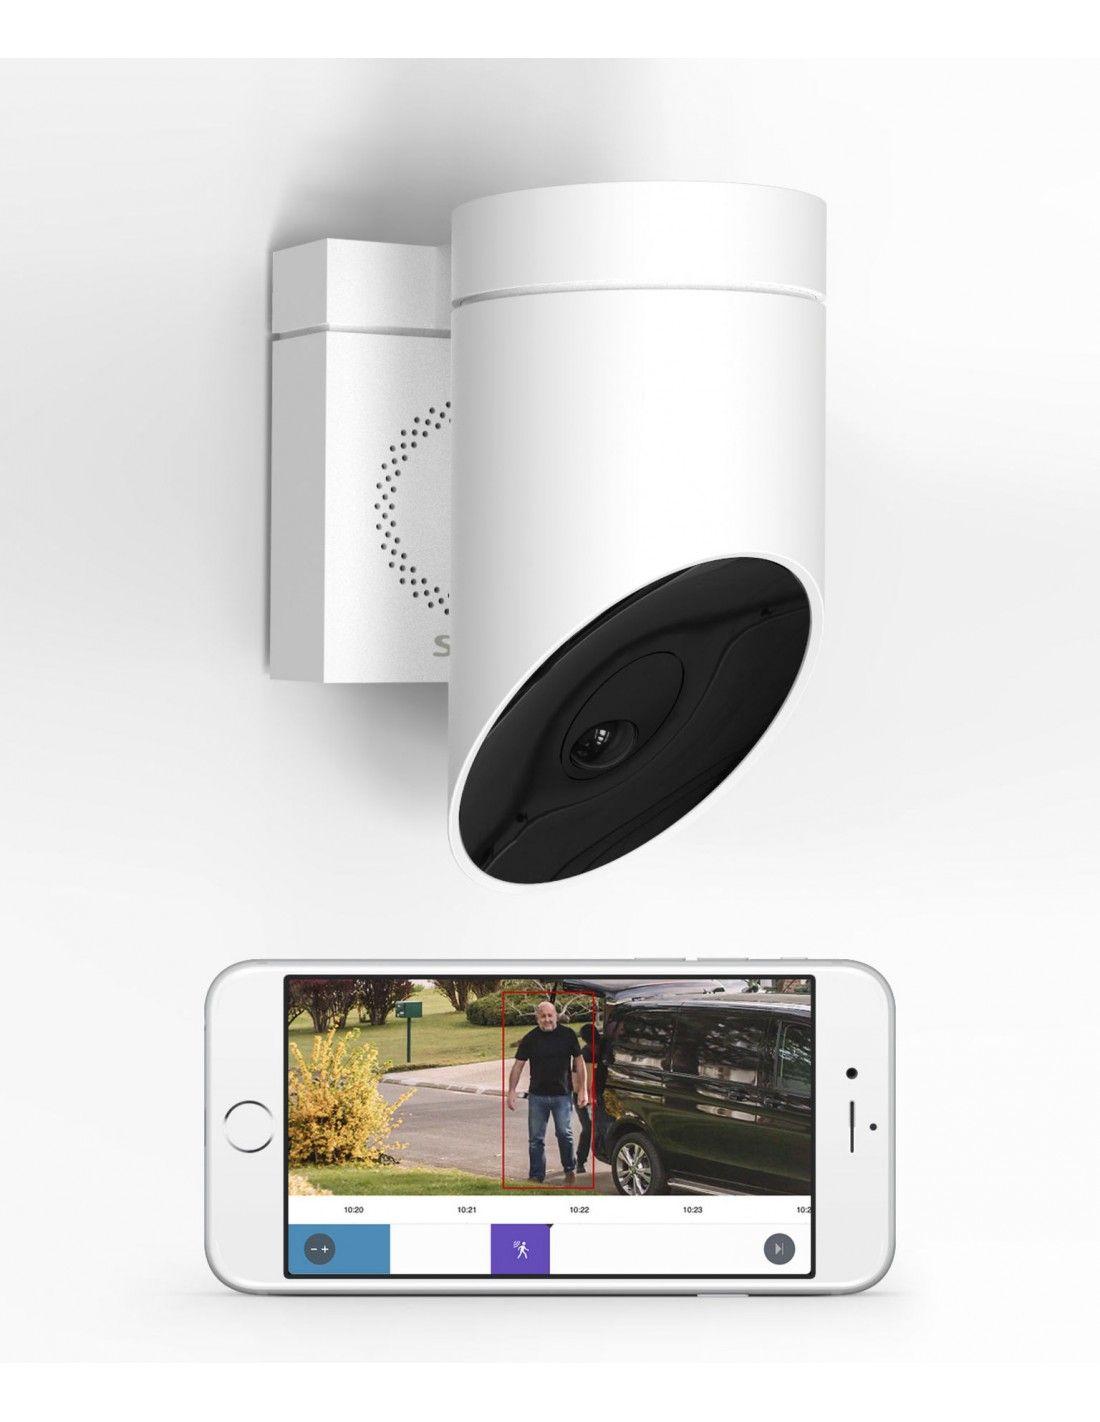 somfy cam ra ext rieure grise somfy outdoor camera. Black Bedroom Furniture Sets. Home Design Ideas